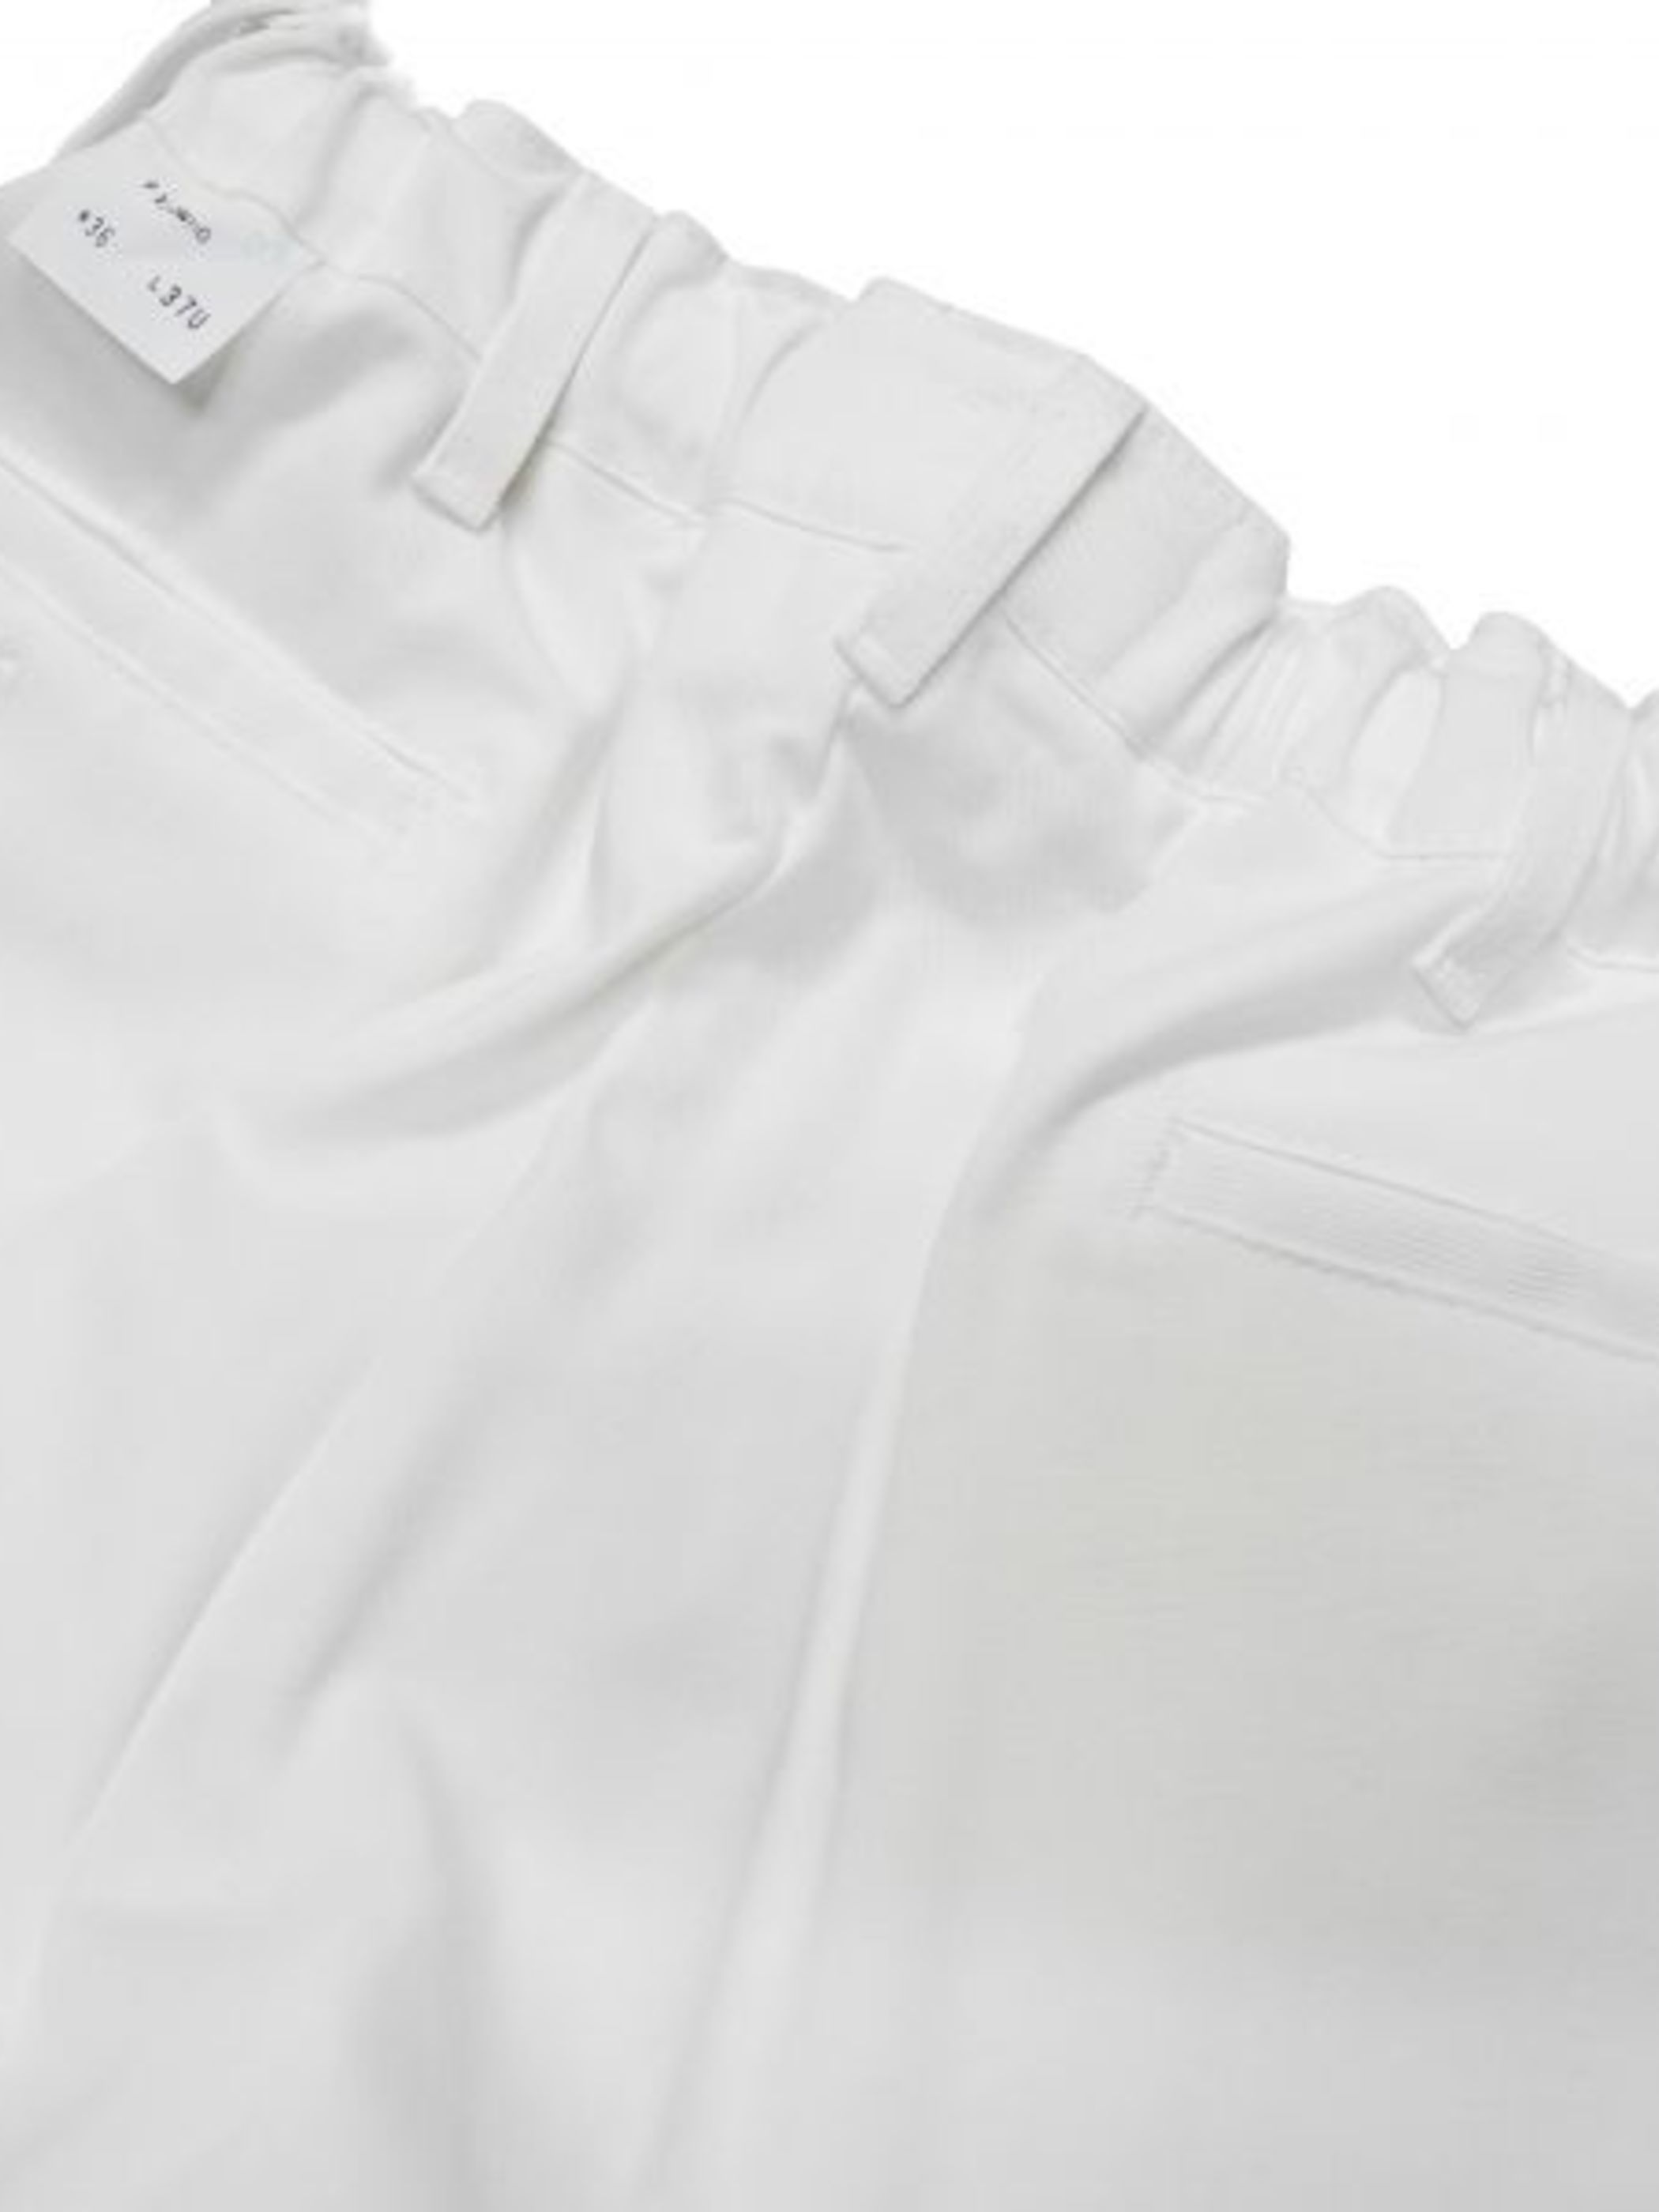 Remake Product REMAKE REDKAP M-65 TYPE PANTS WHITE